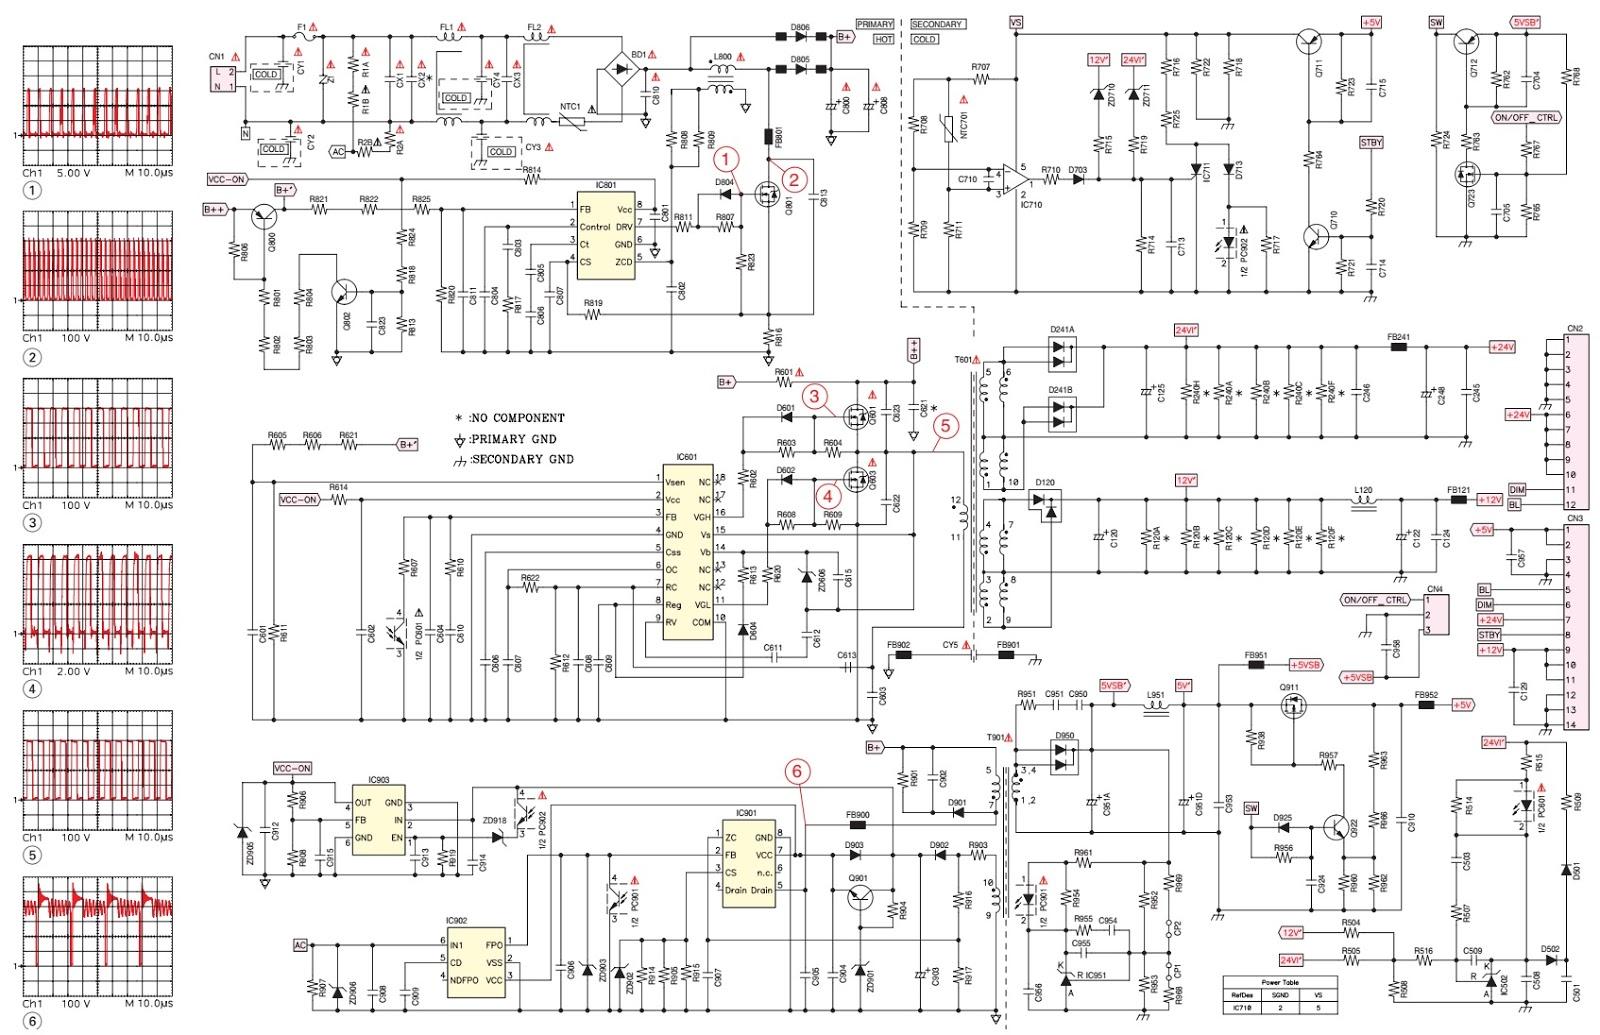 grundig lcd tv smps circuit diagram dps 145pp 133 electro help inverter pcb board circuit diagram inverter pcb board circuit diagram [ 1600 x 1035 Pixel ]